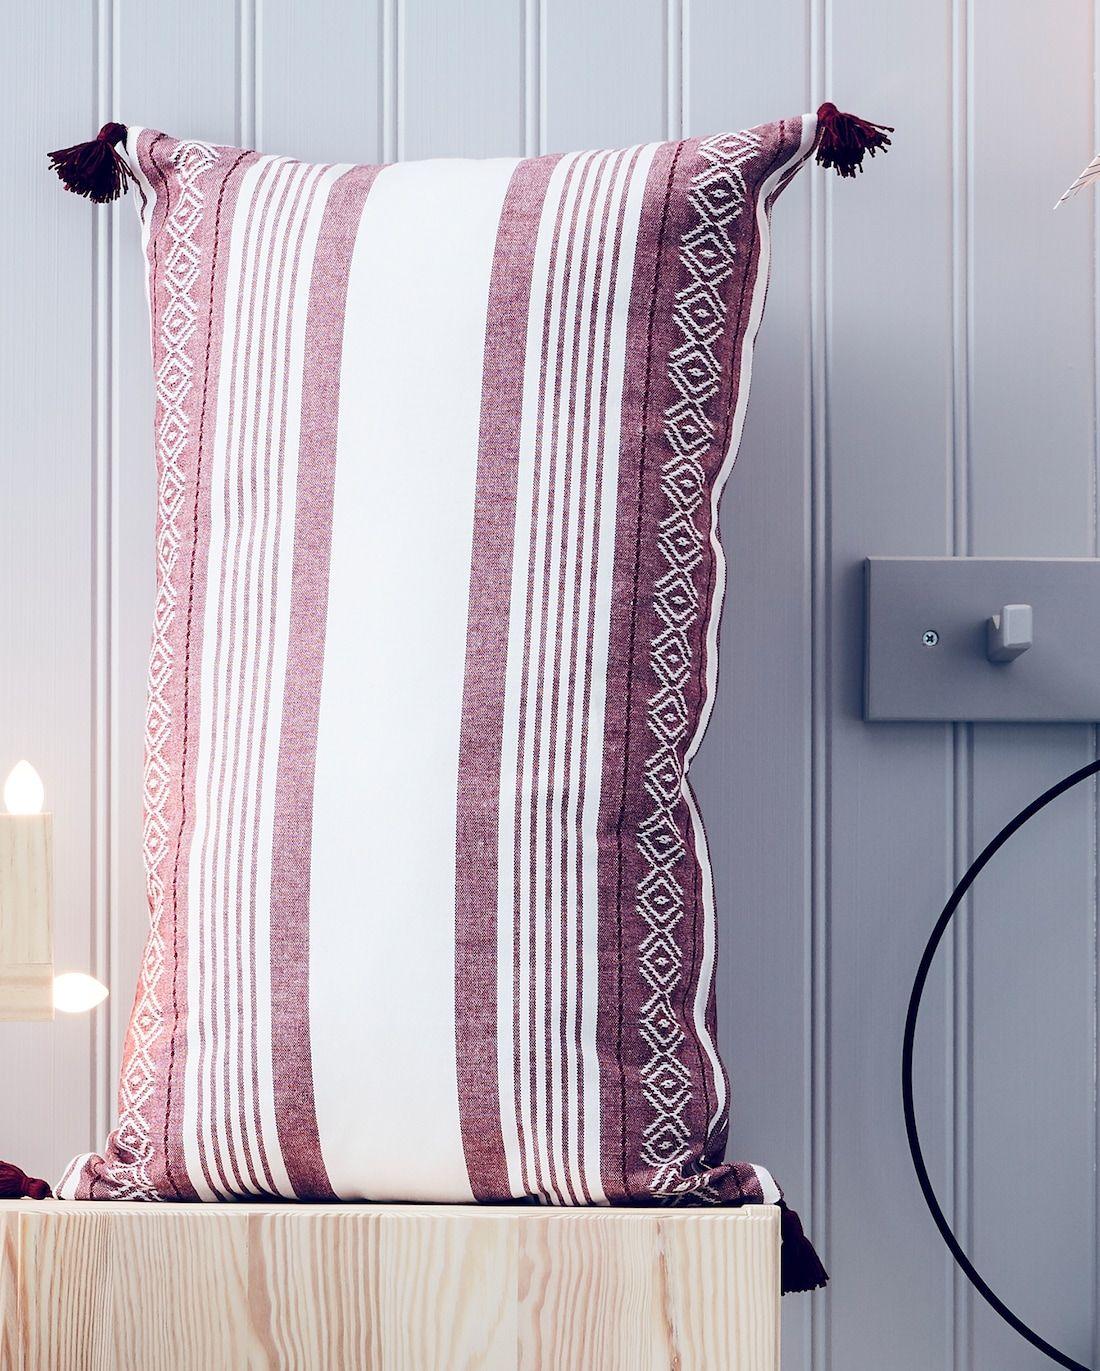 Cuscino Alla Francese Ikea natale - ikea | ikea, luci decorative, apparecchiare la tavola